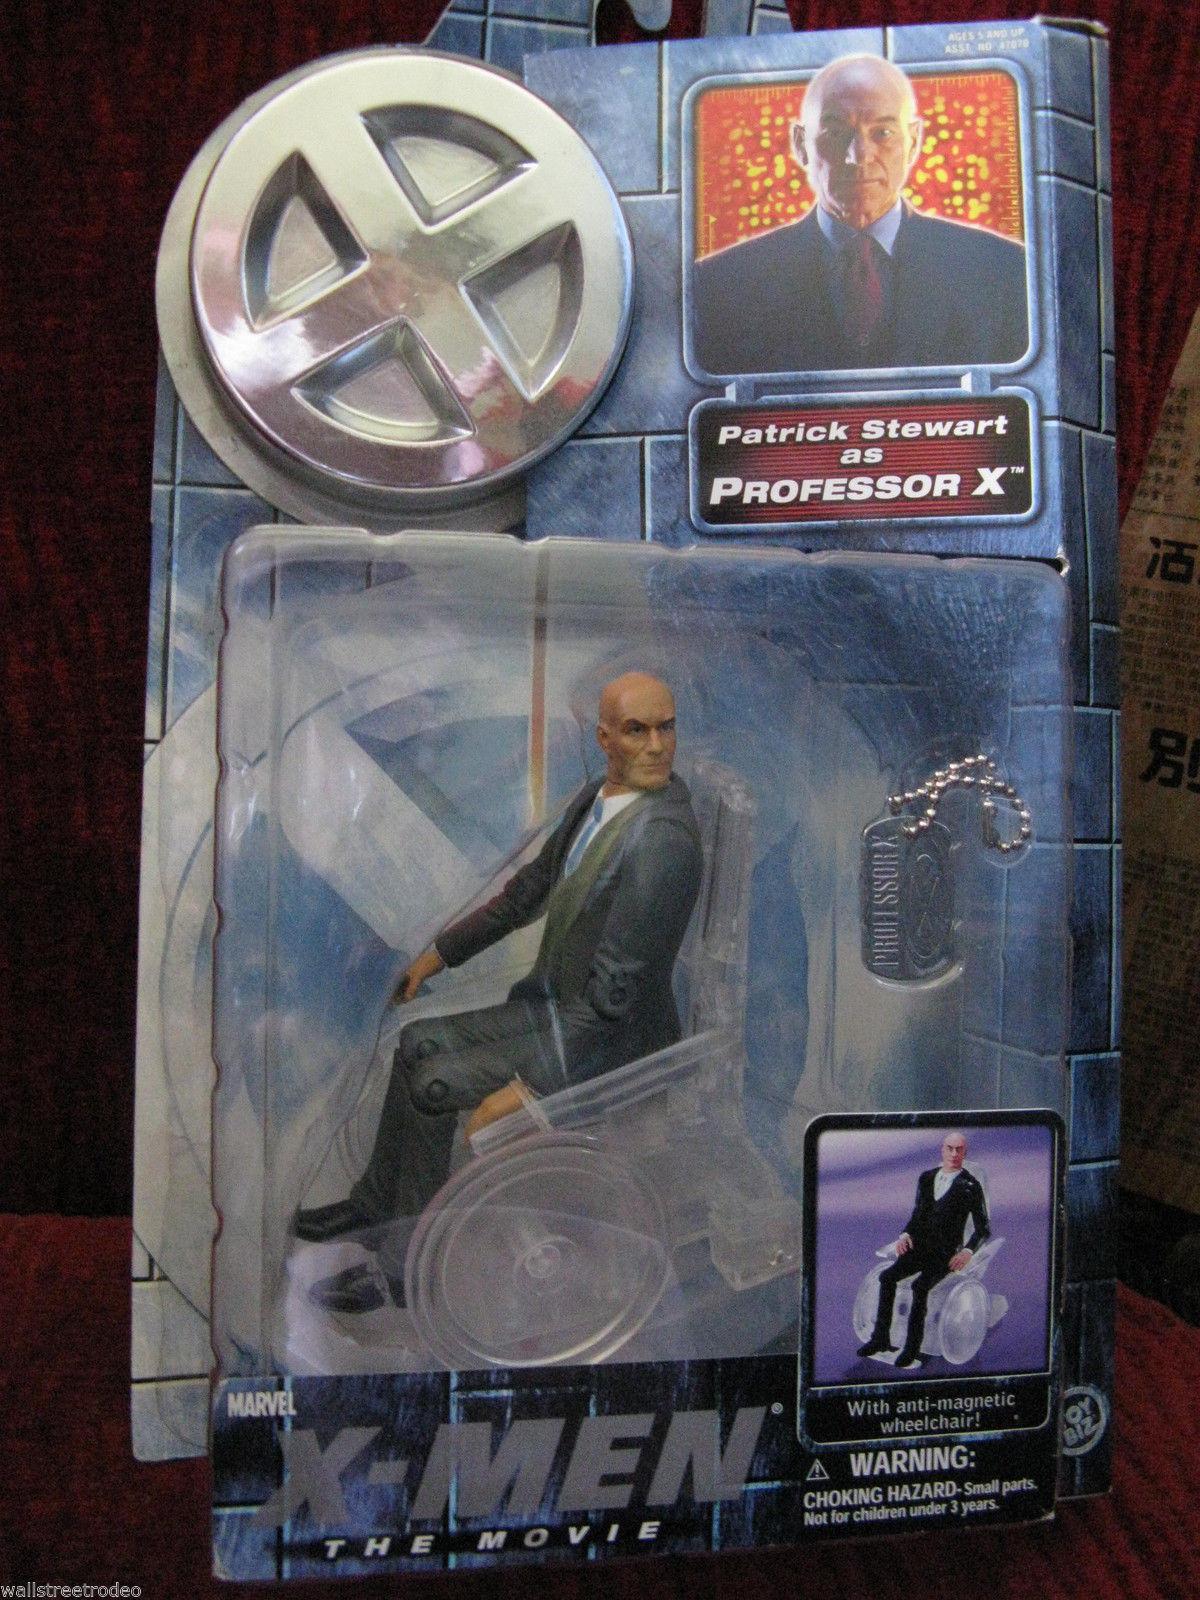 Marvel X-Men Professor X Patrick Stewart anti-magnetic wheelchair action figure